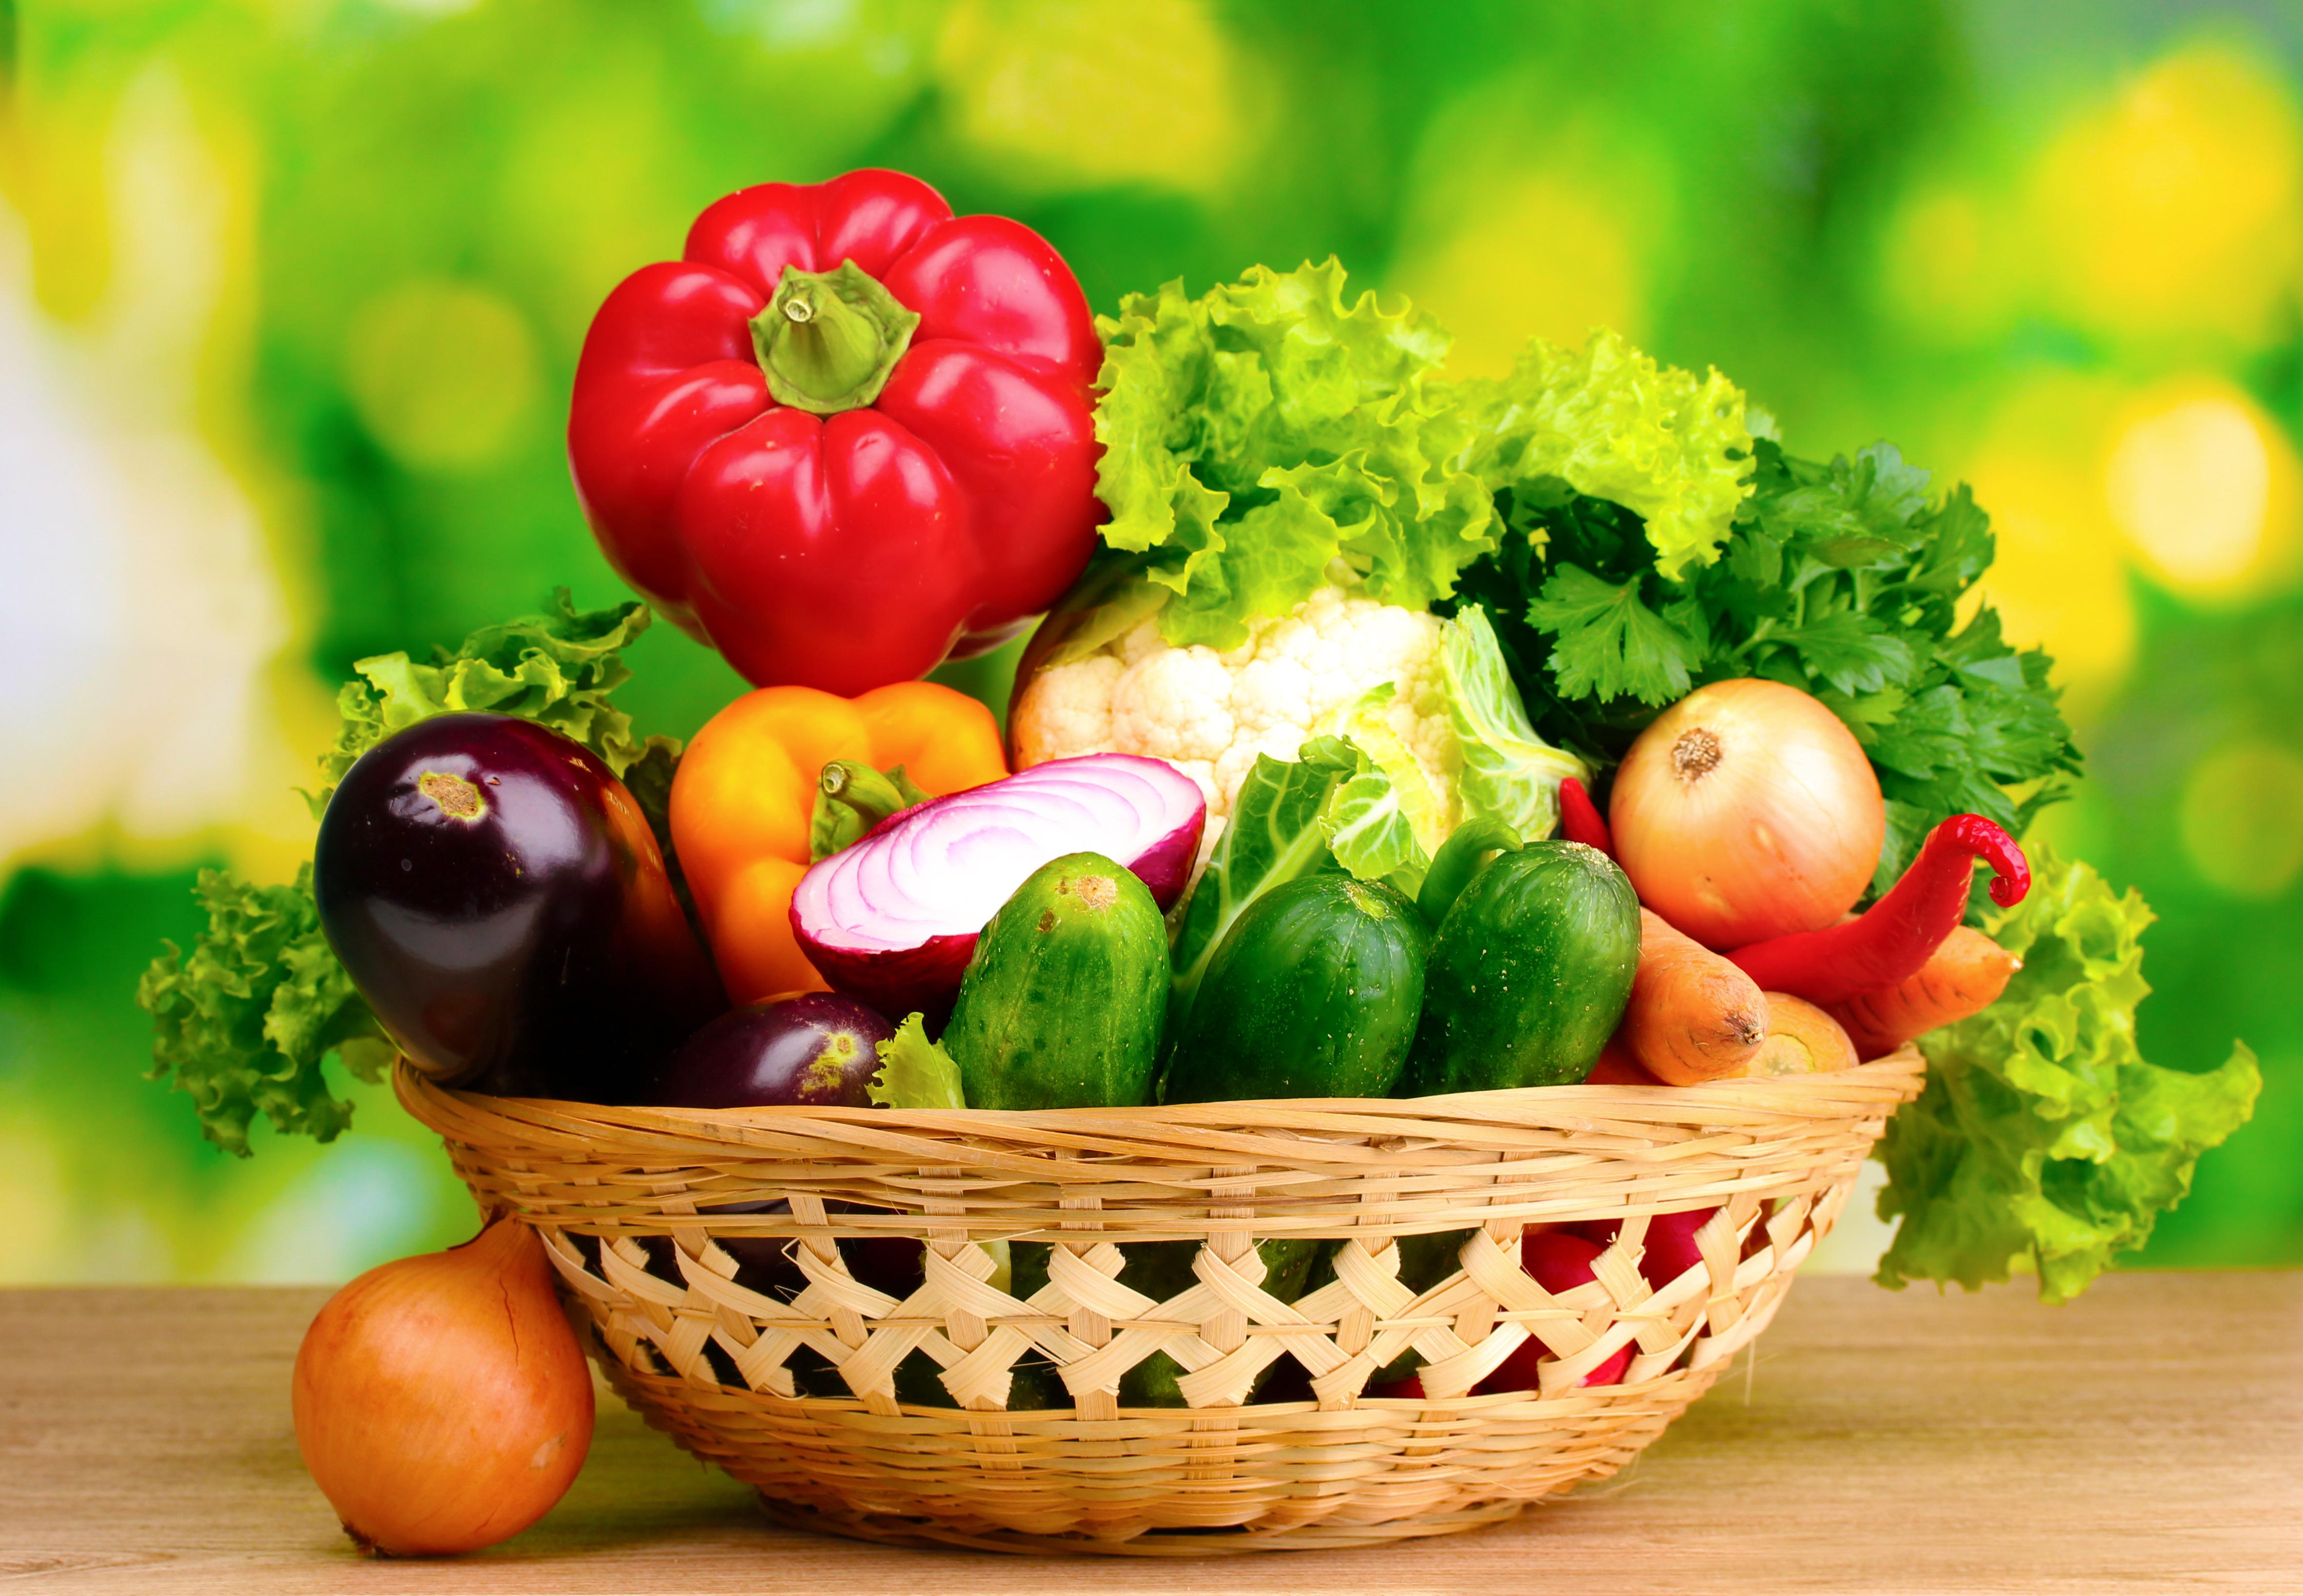 картинки про овощей сочетании